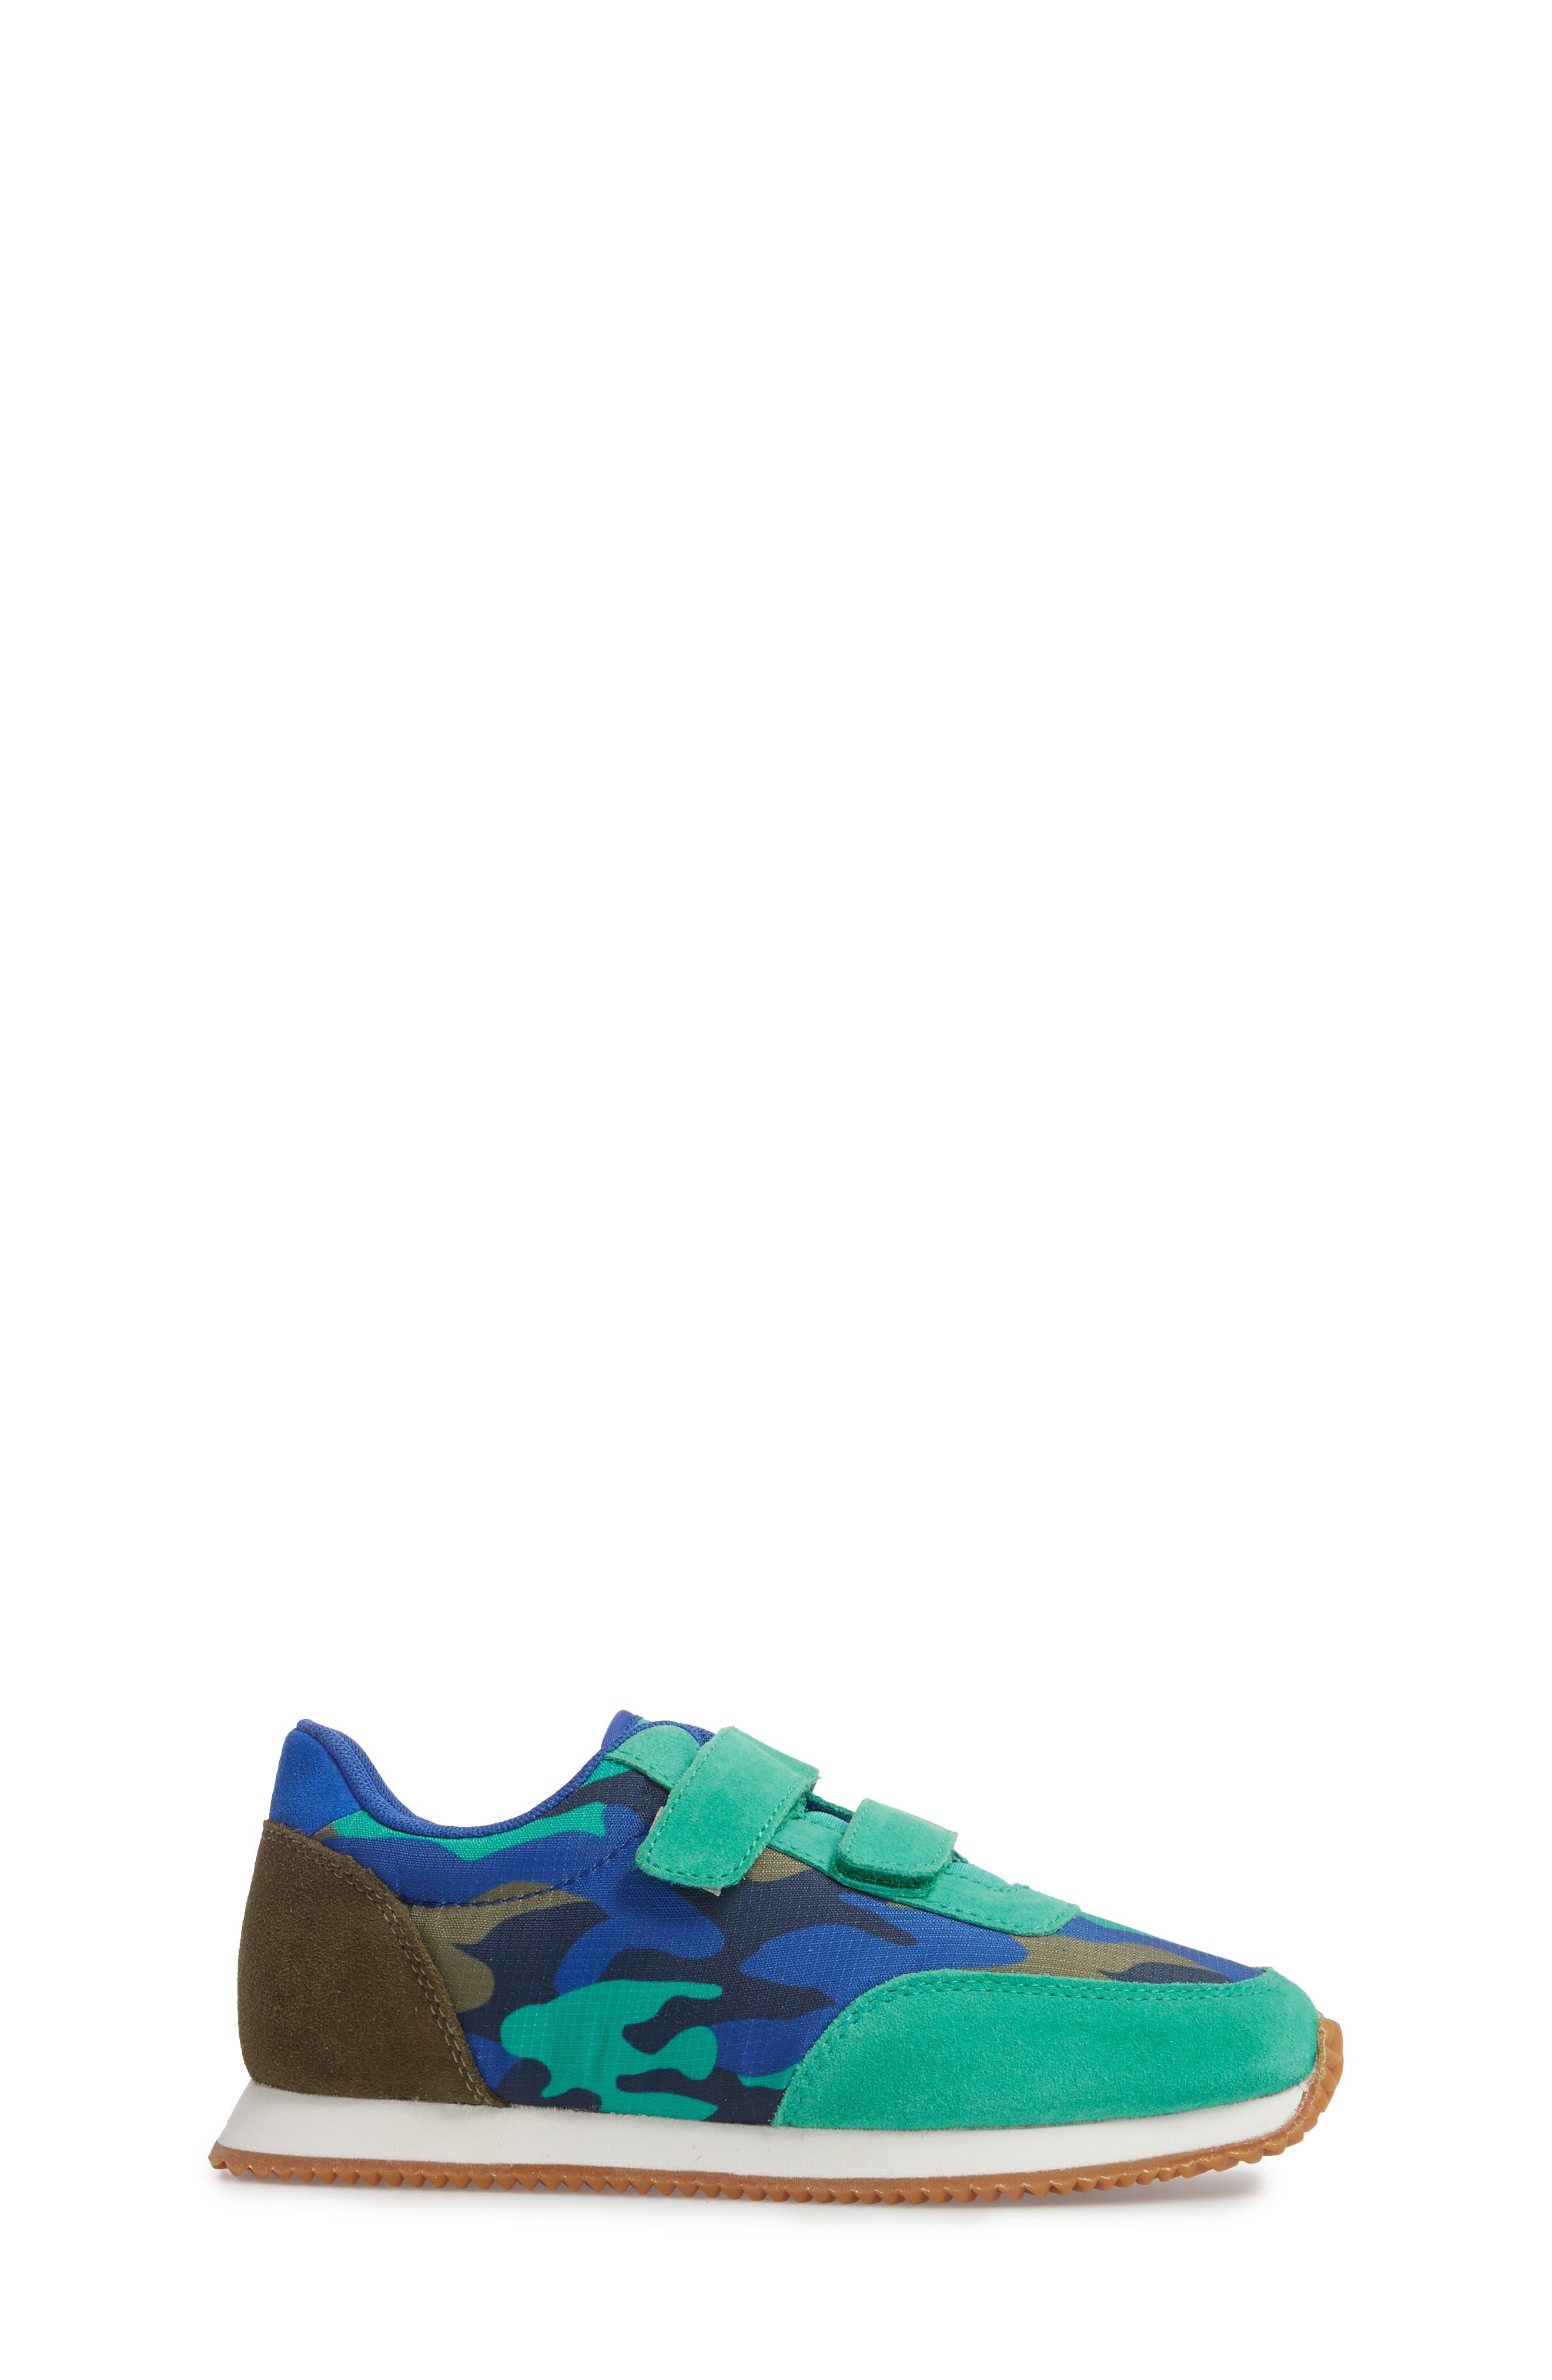 Print Sneakers,                             Alternate thumbnail 3, color,                             315